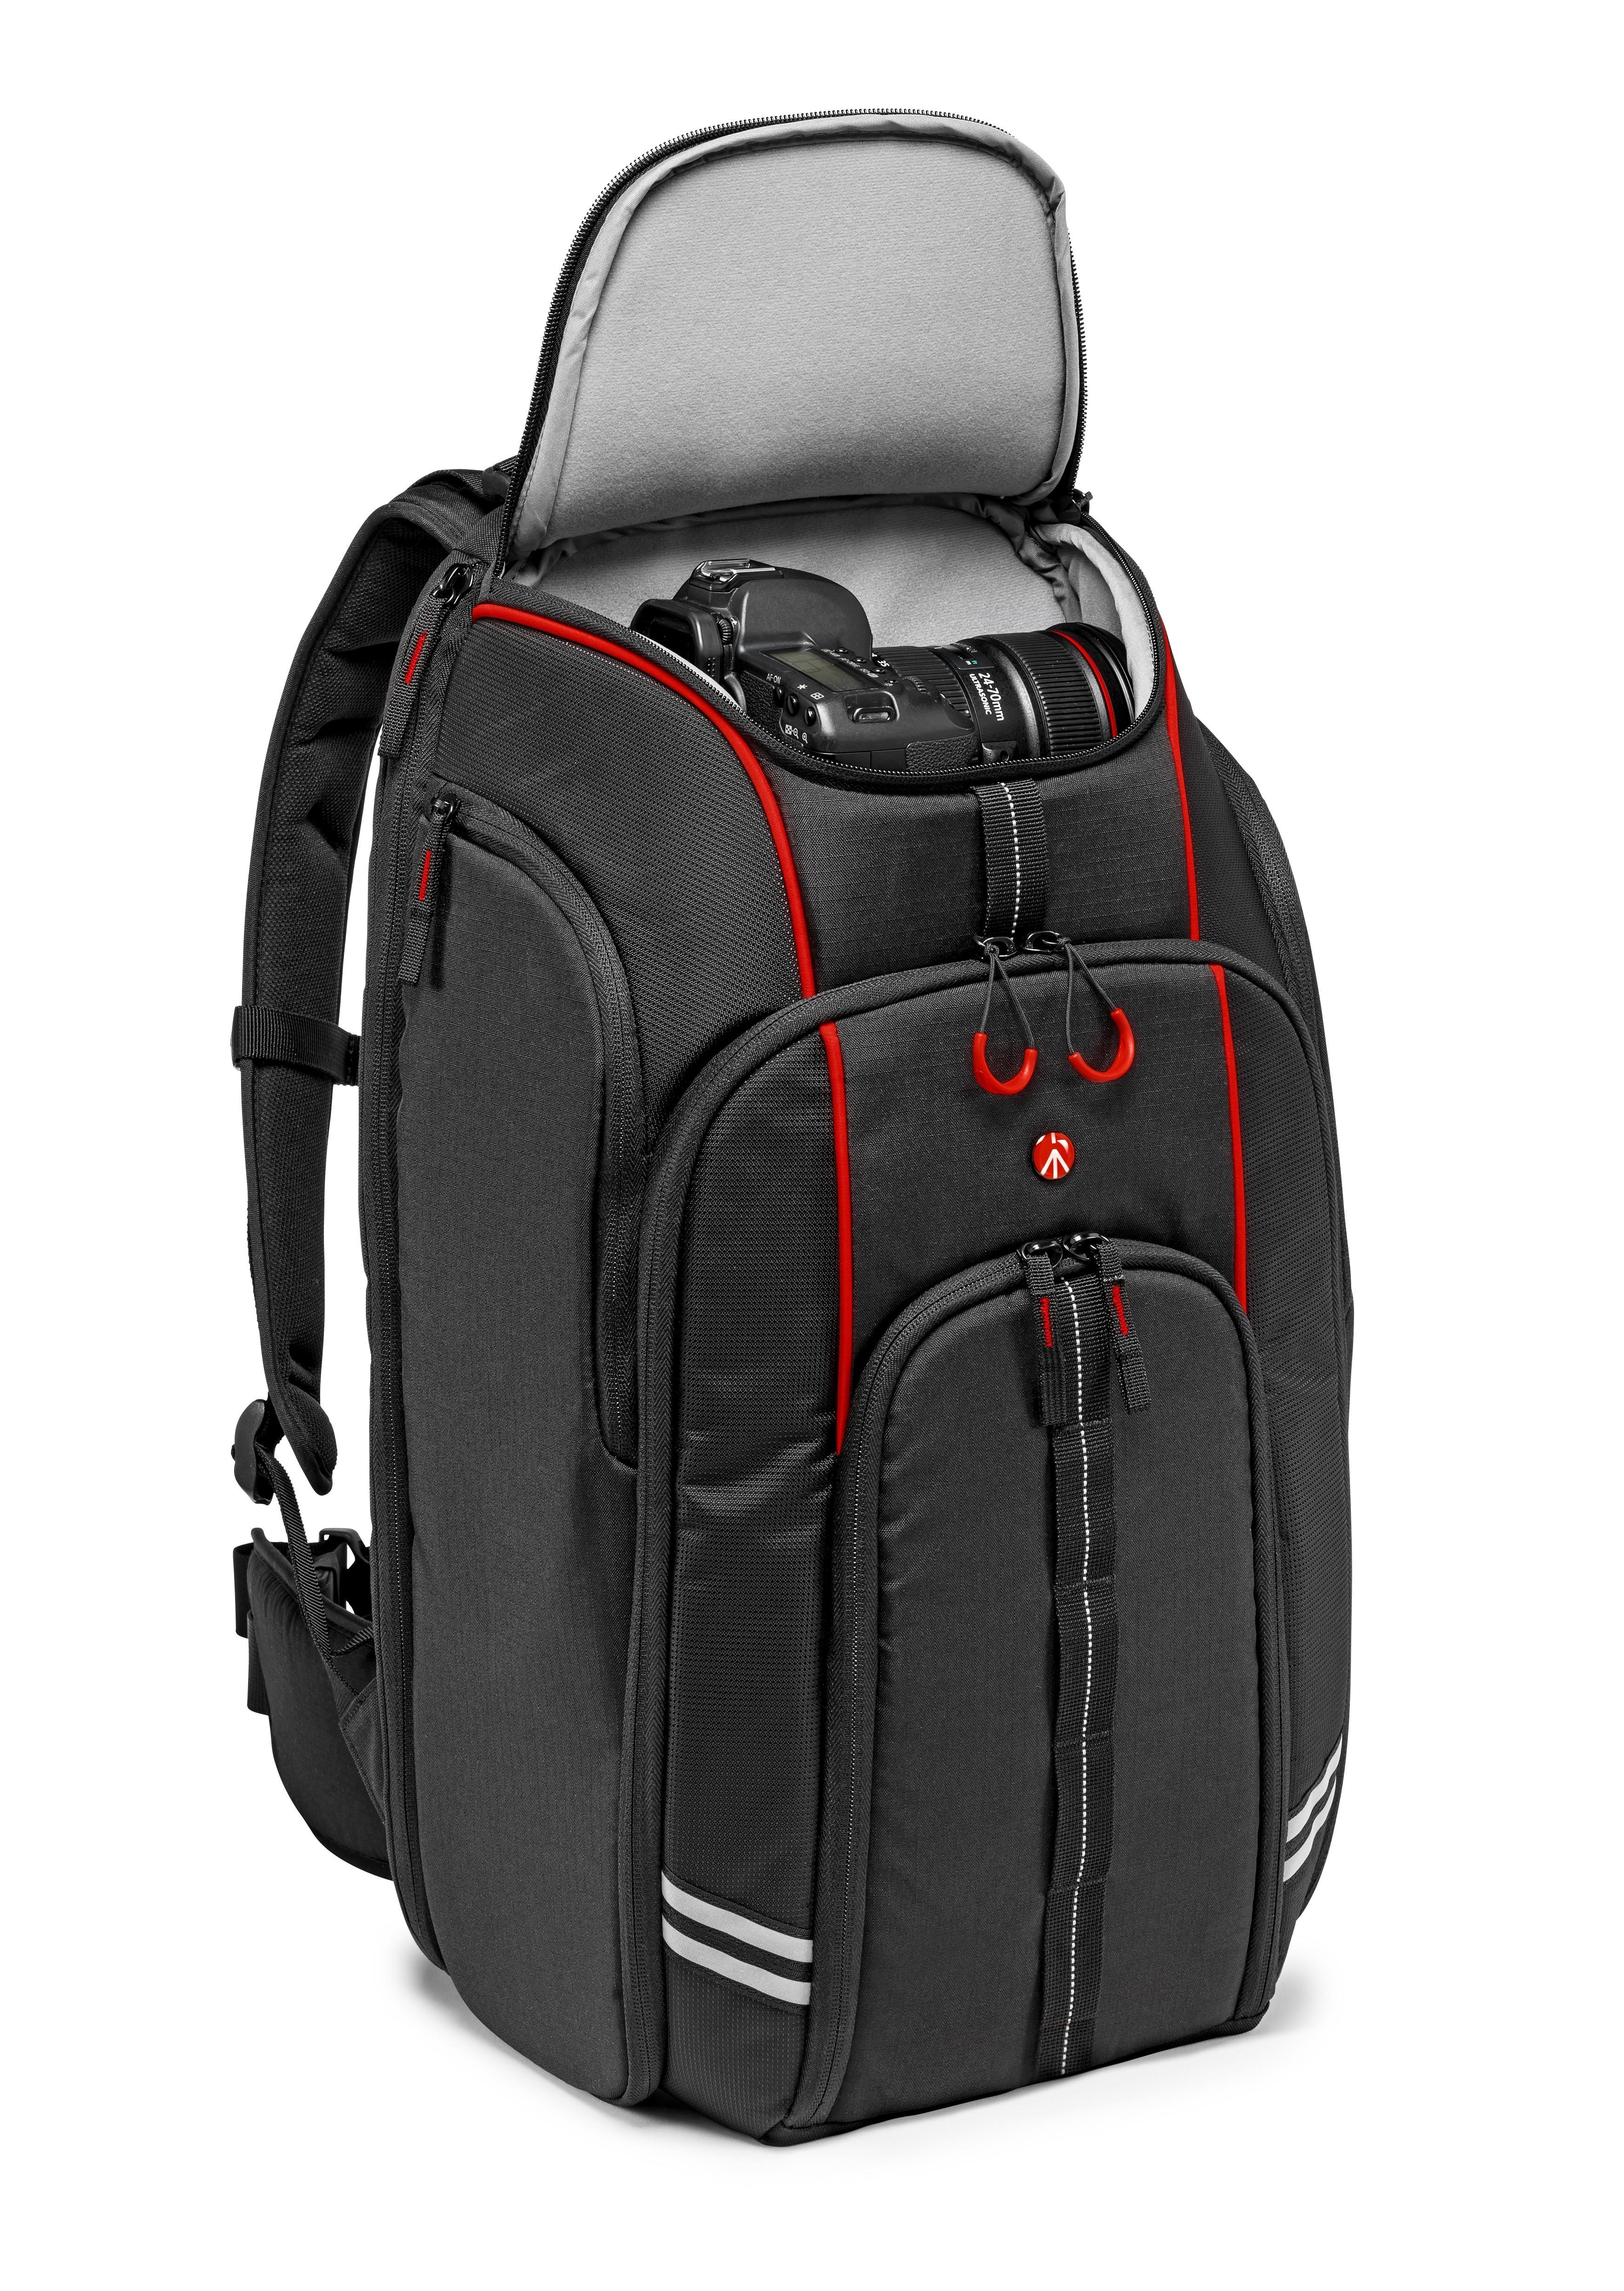 pack phantom 4 advanced sac dos manfrotto bdl ph4advman1 droneshop. Black Bedroom Furniture Sets. Home Design Ideas